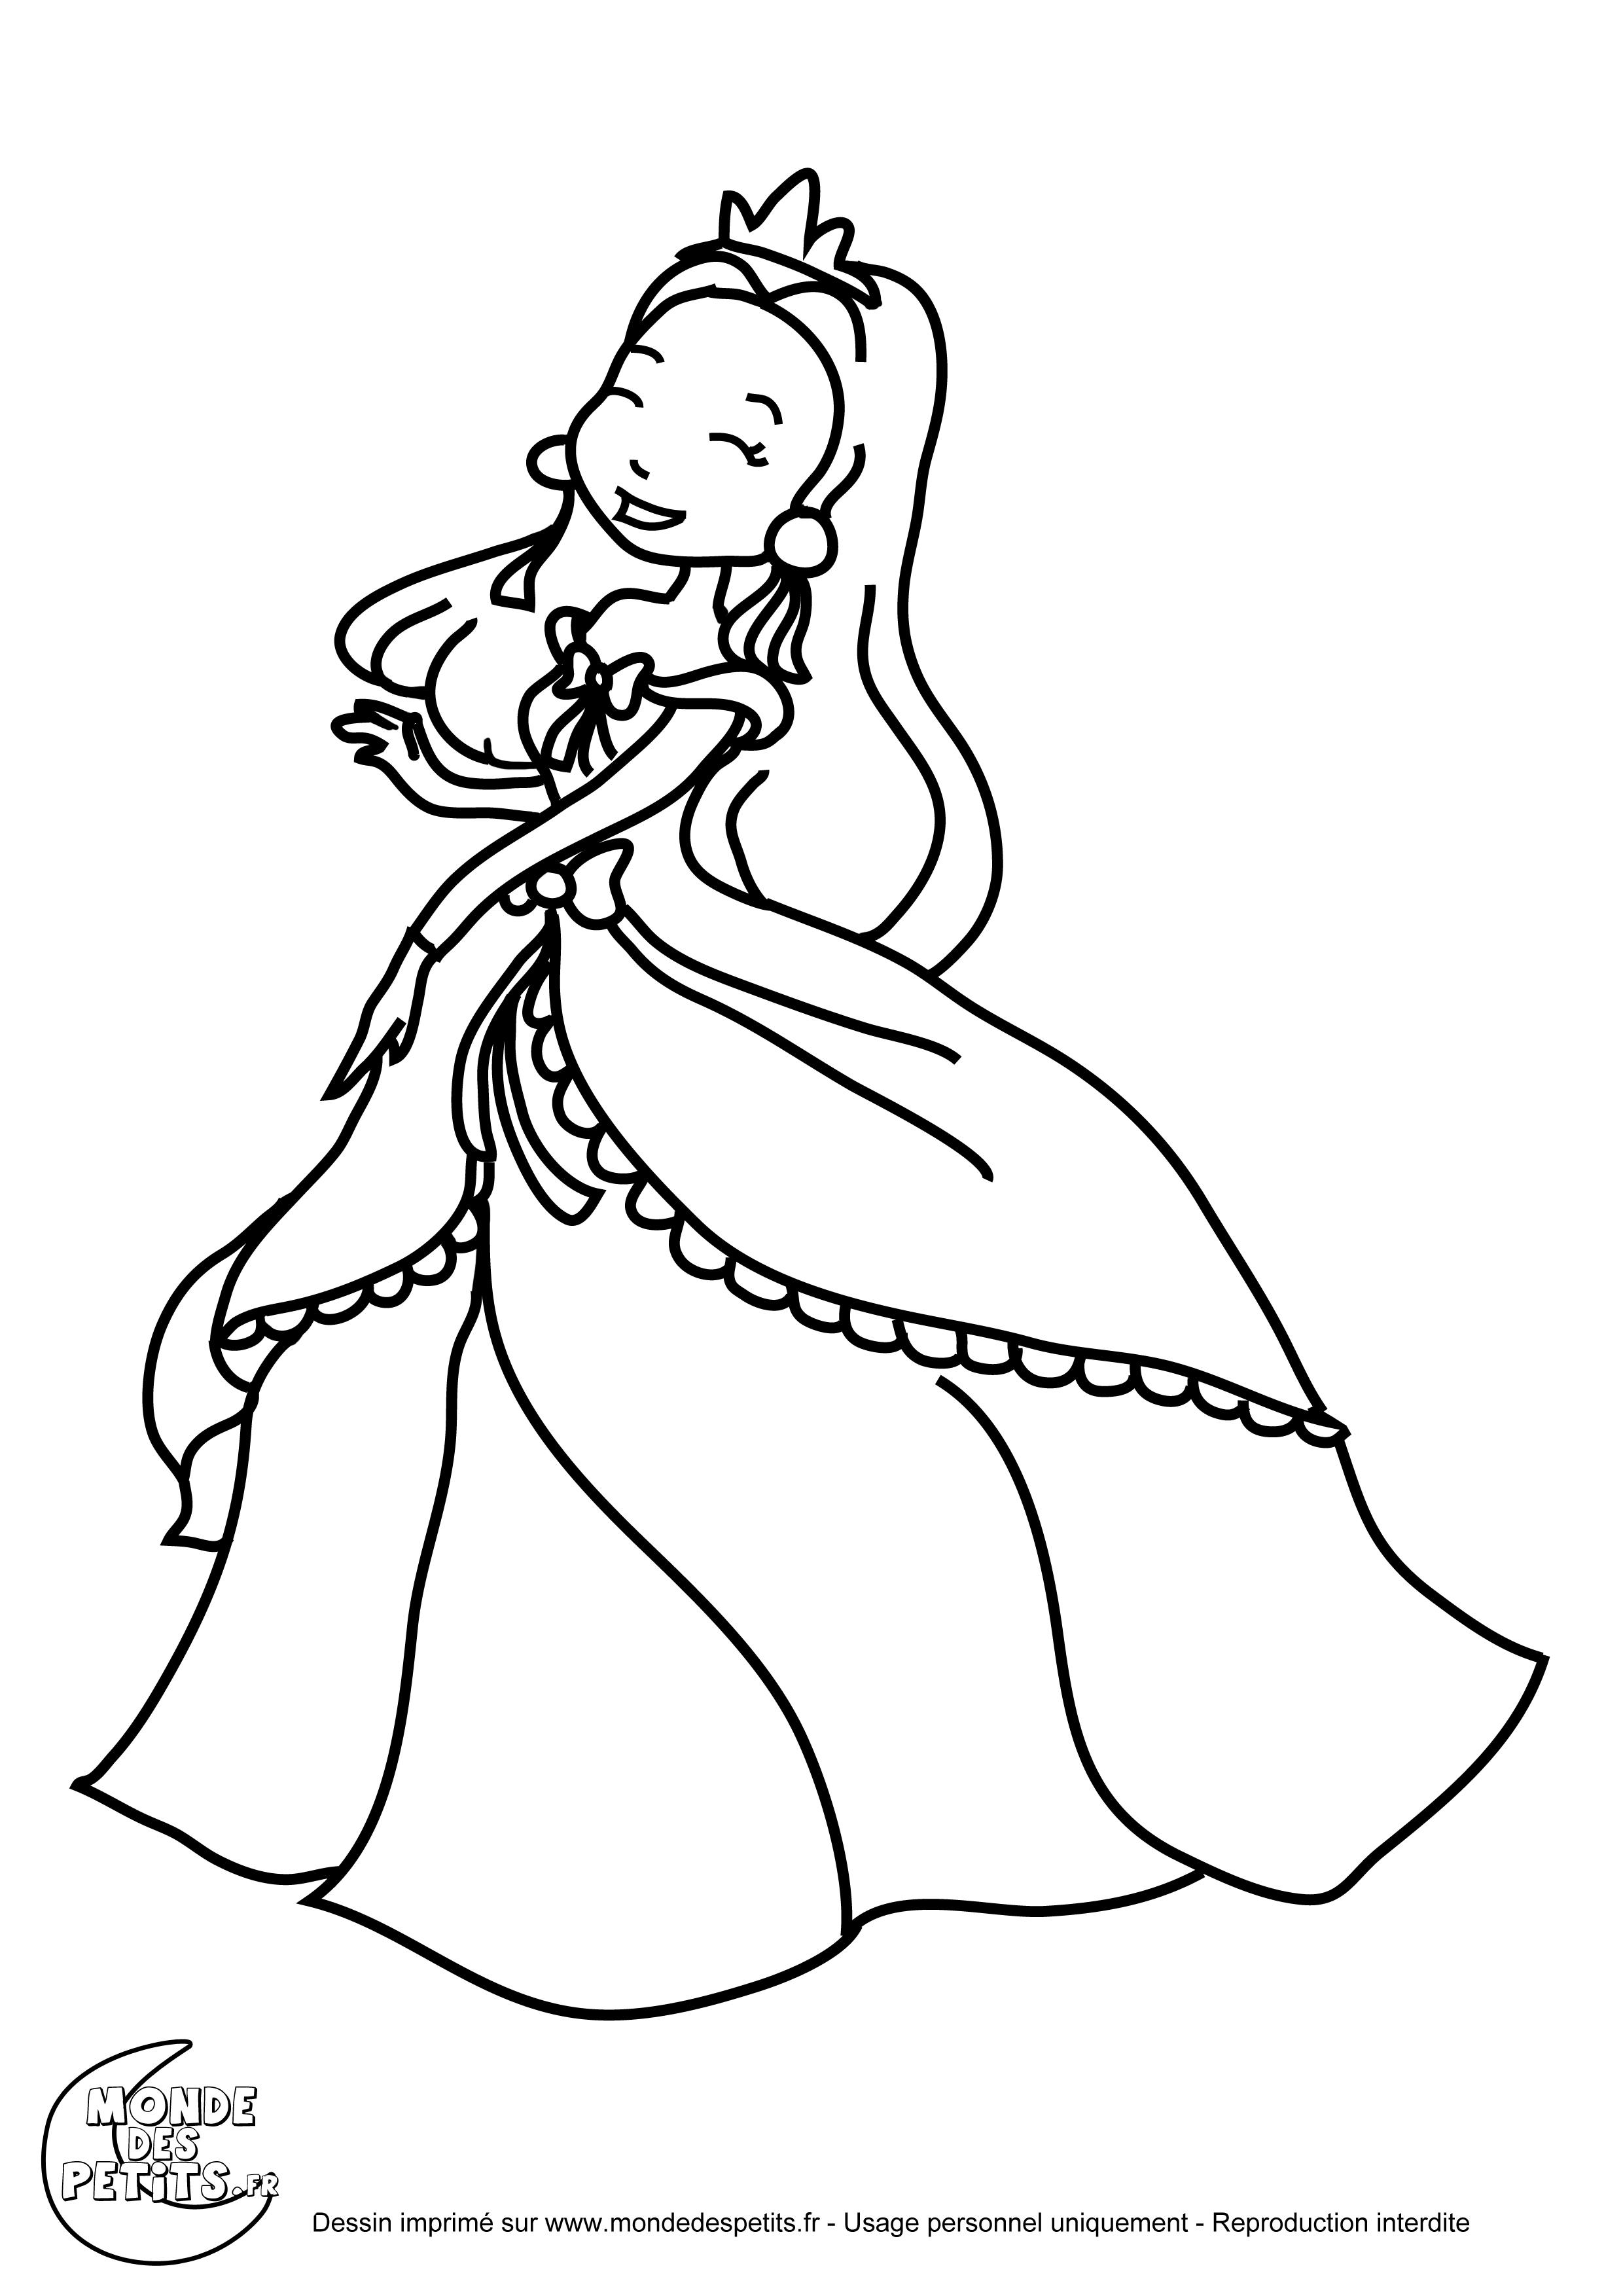 Inspirant Dessin A Colorier A Imprimer De Princesse